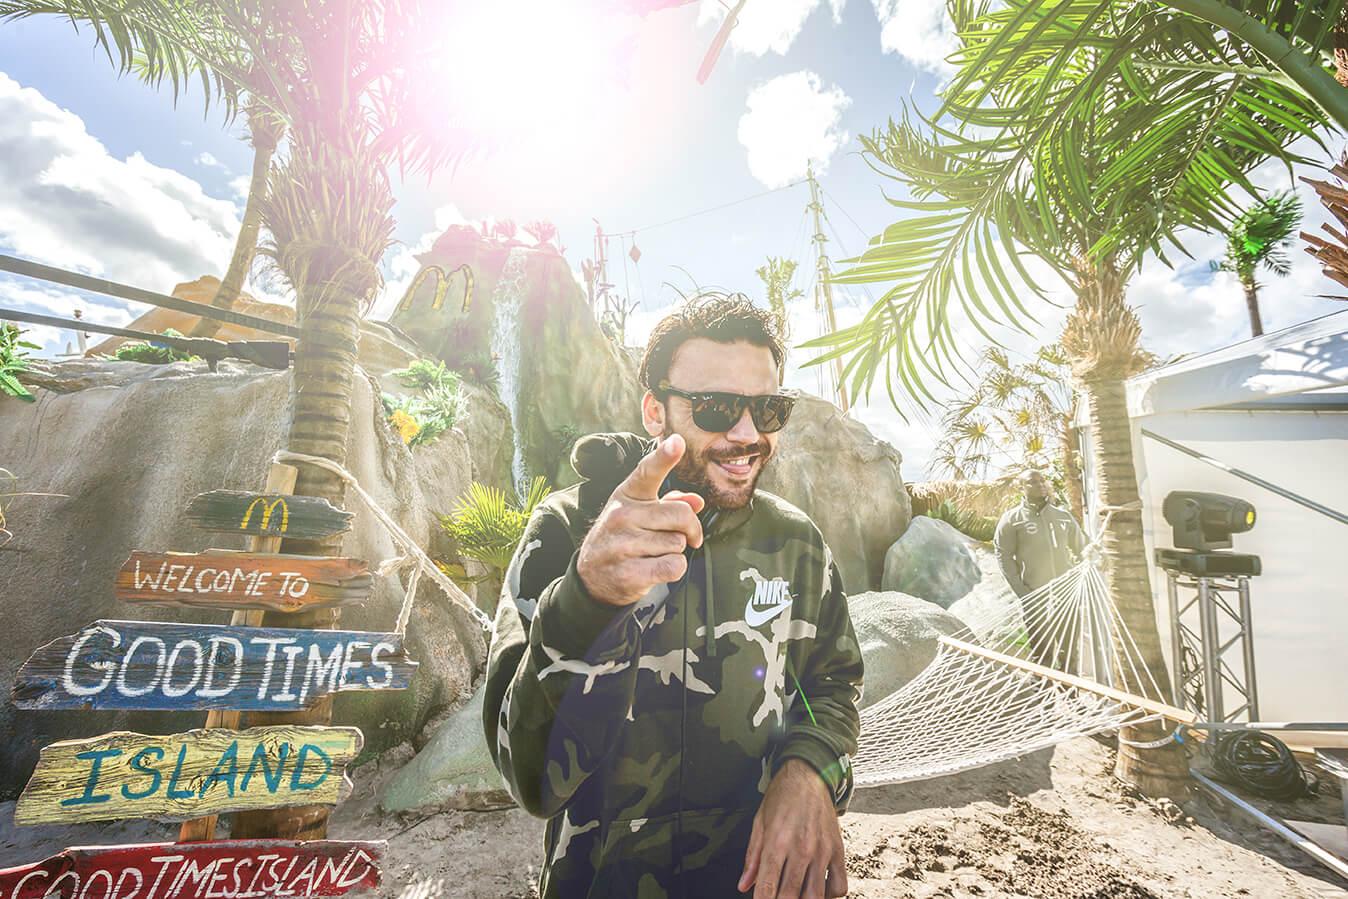 DJ LARZ op McDonald's Good Times Island